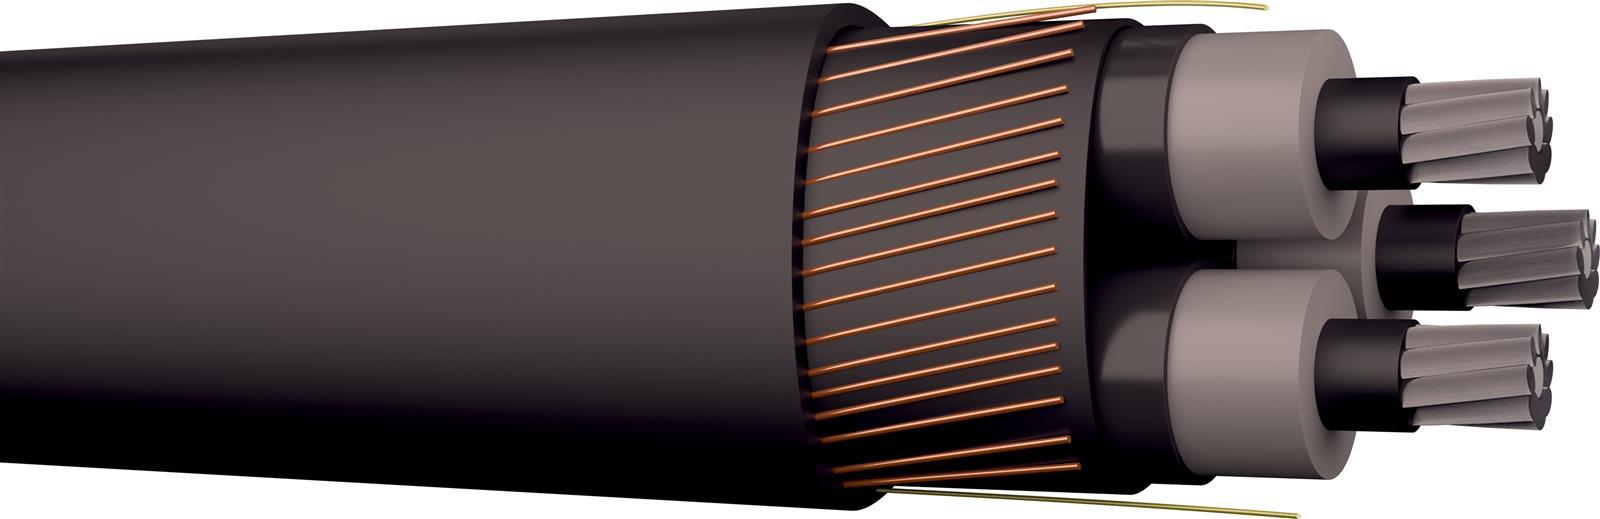 AXQJ-RMF PURE 3X50/16 12KV T5